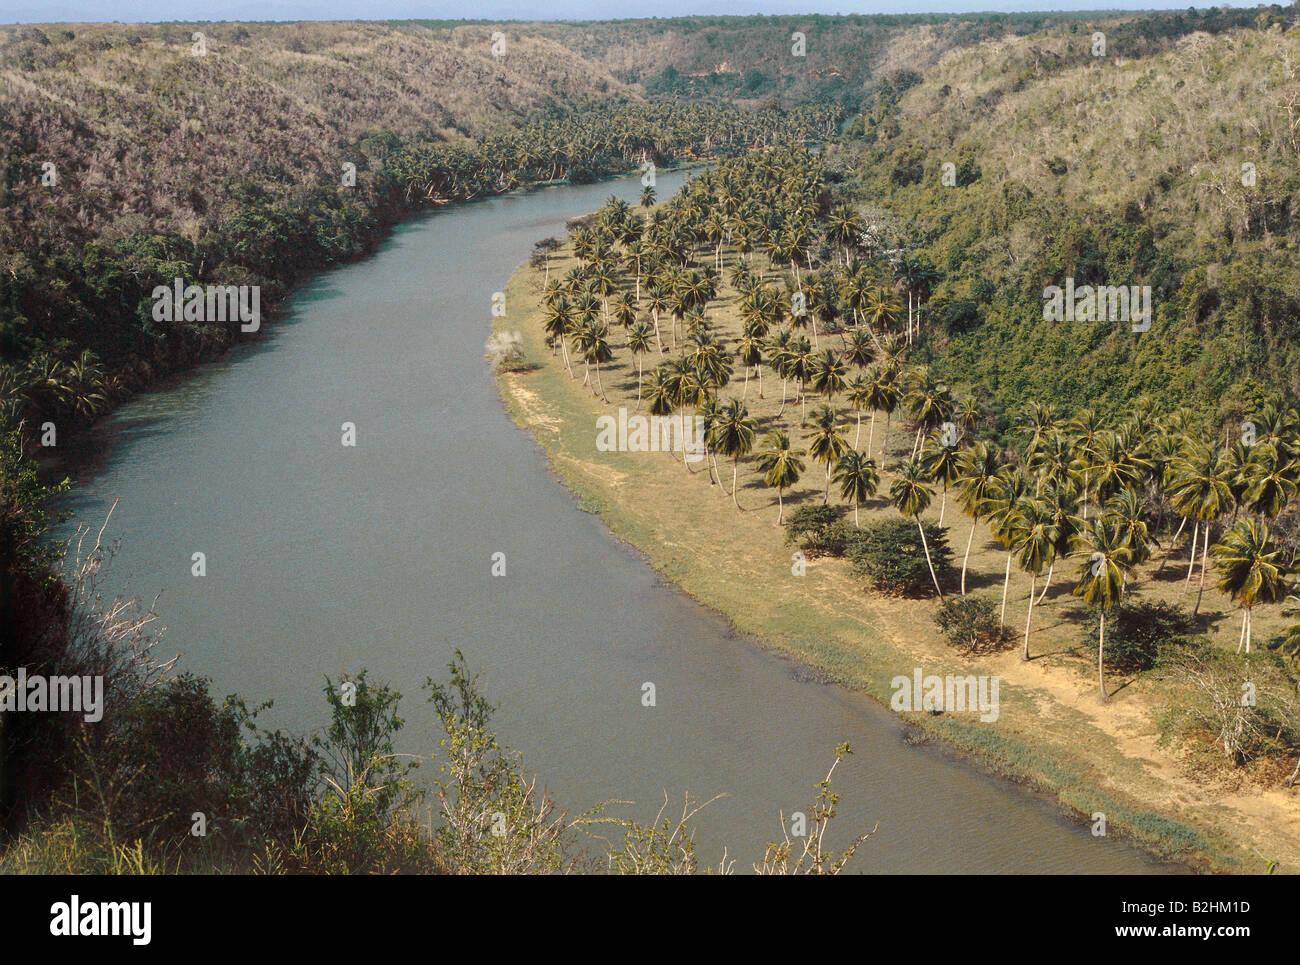 geography / travel, Dominican Republic, landscapes, rivers, Rio Dolce, La Romana, aerial view, Central America, - Stock Image